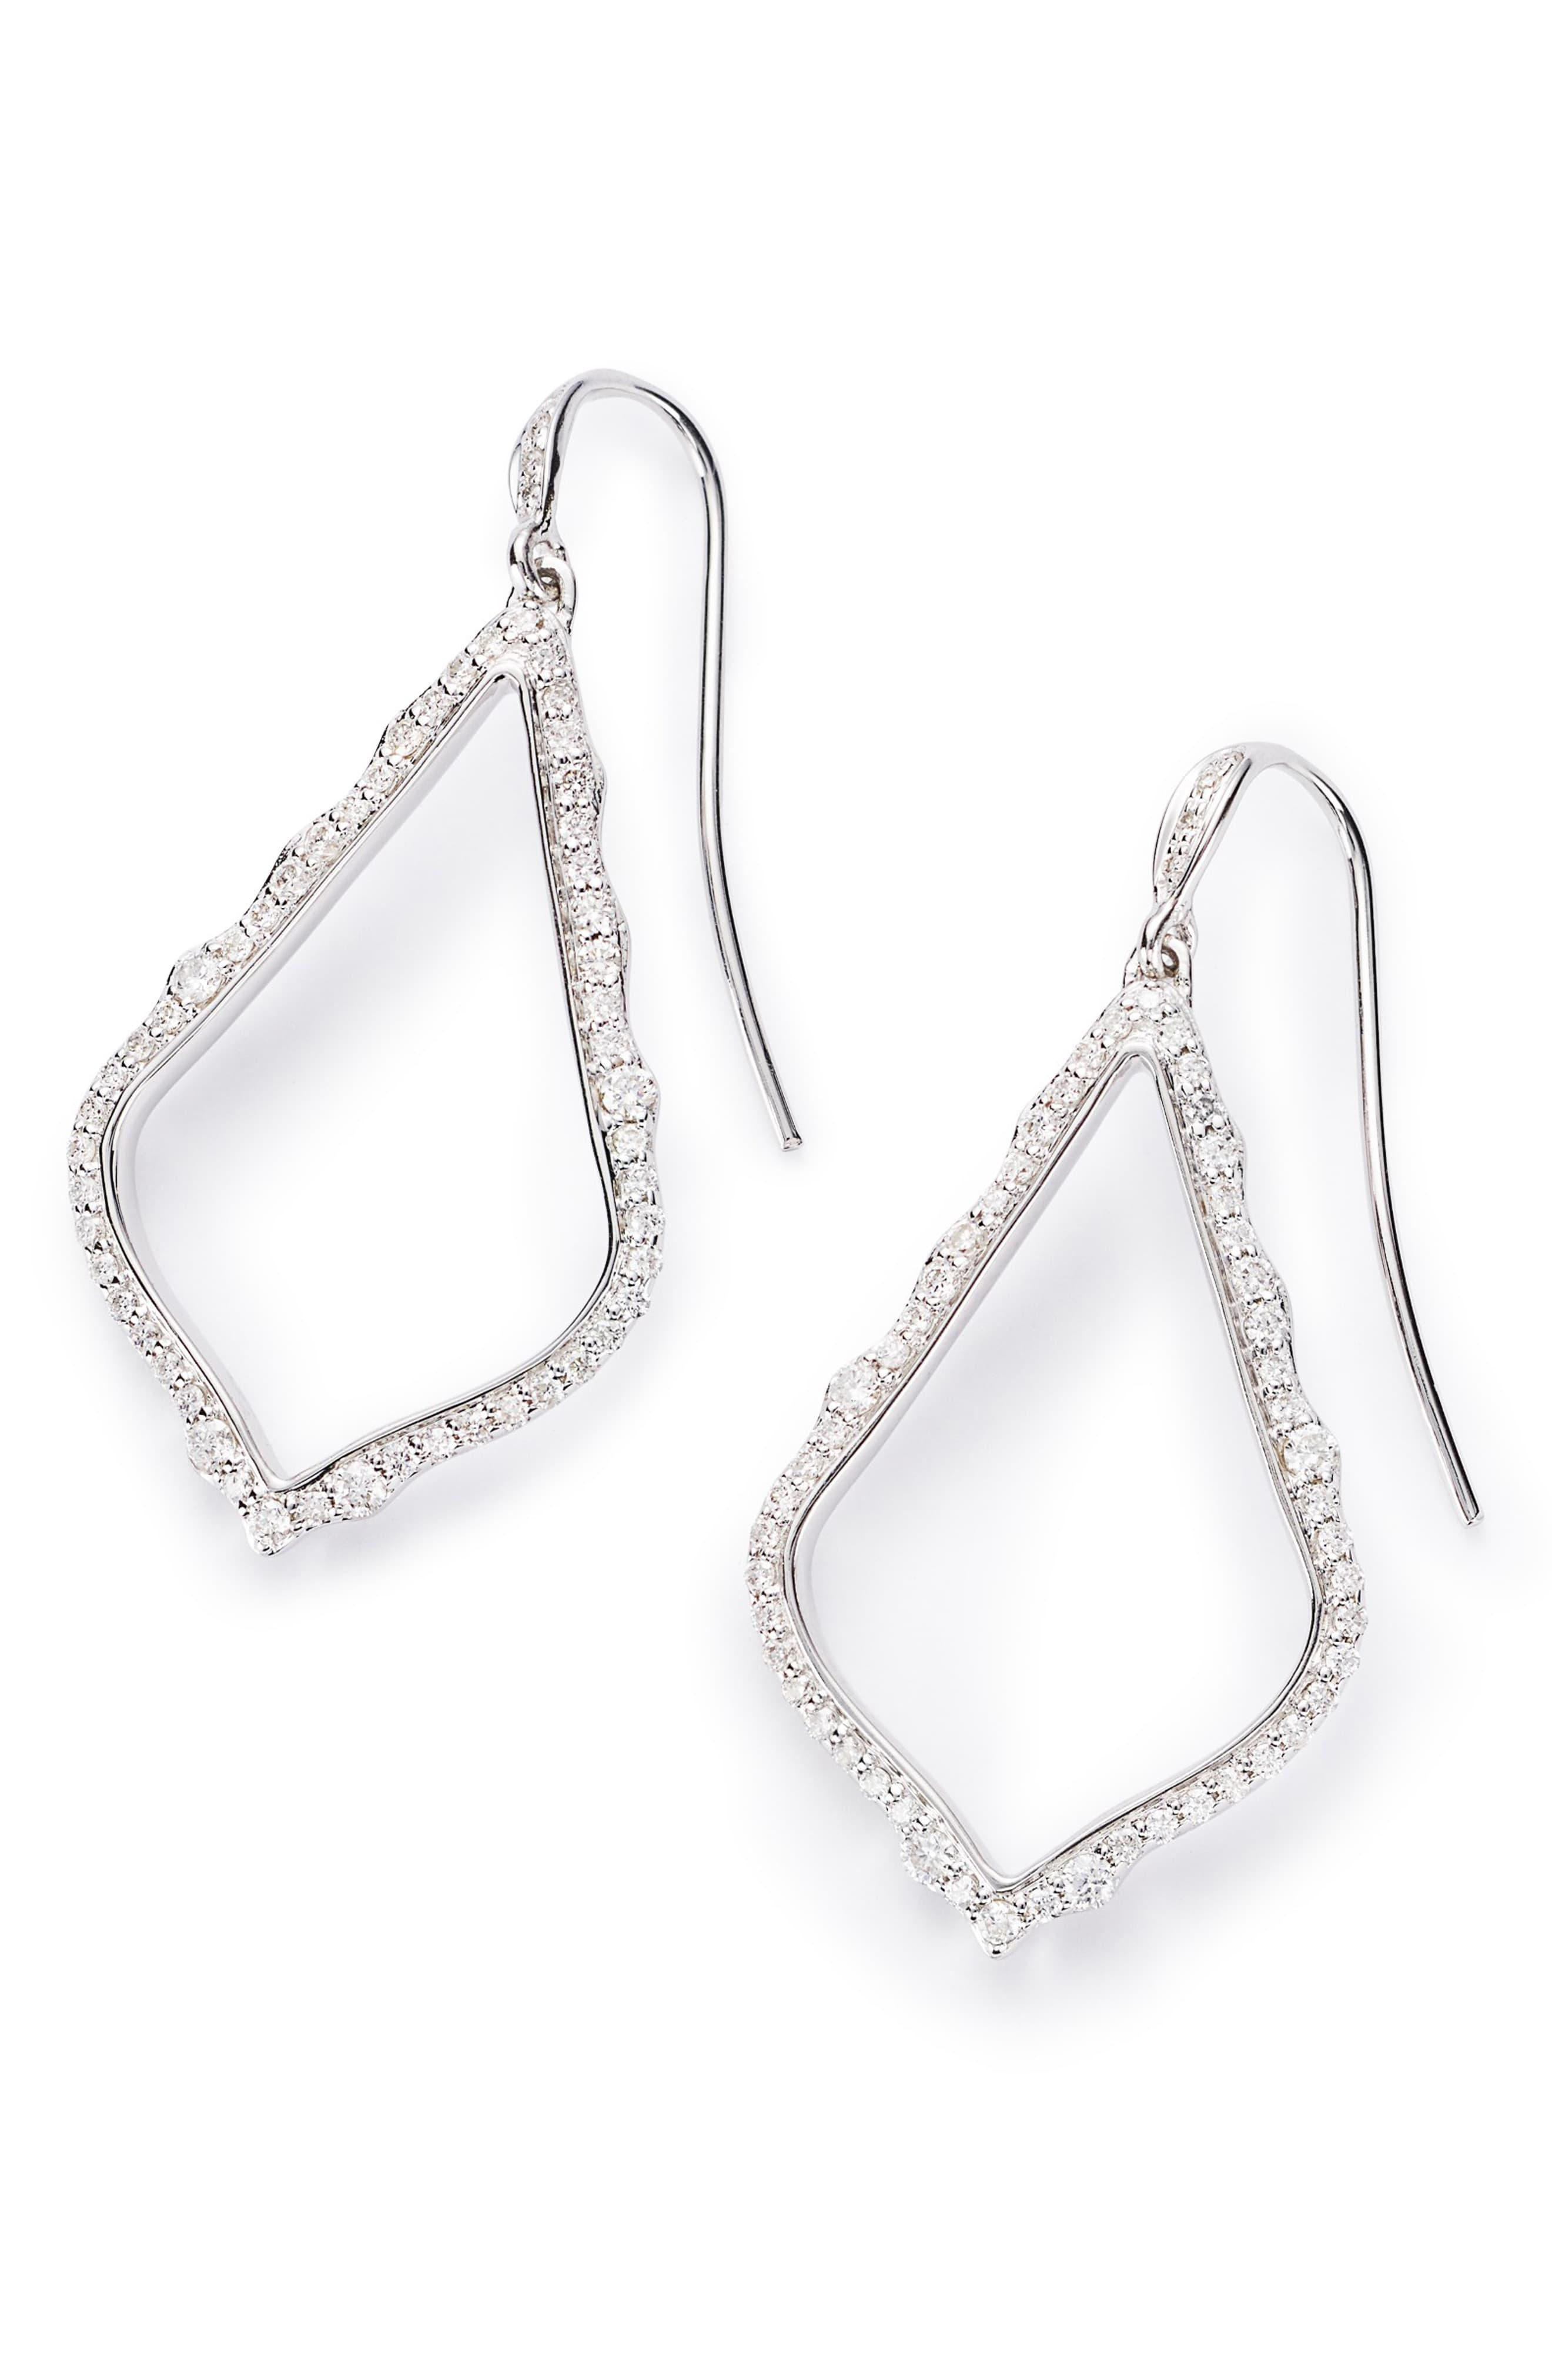 d02f4a288 Lyst - Kendra Scott Sophia 14ct White-gold And Diamond Earrings in ...